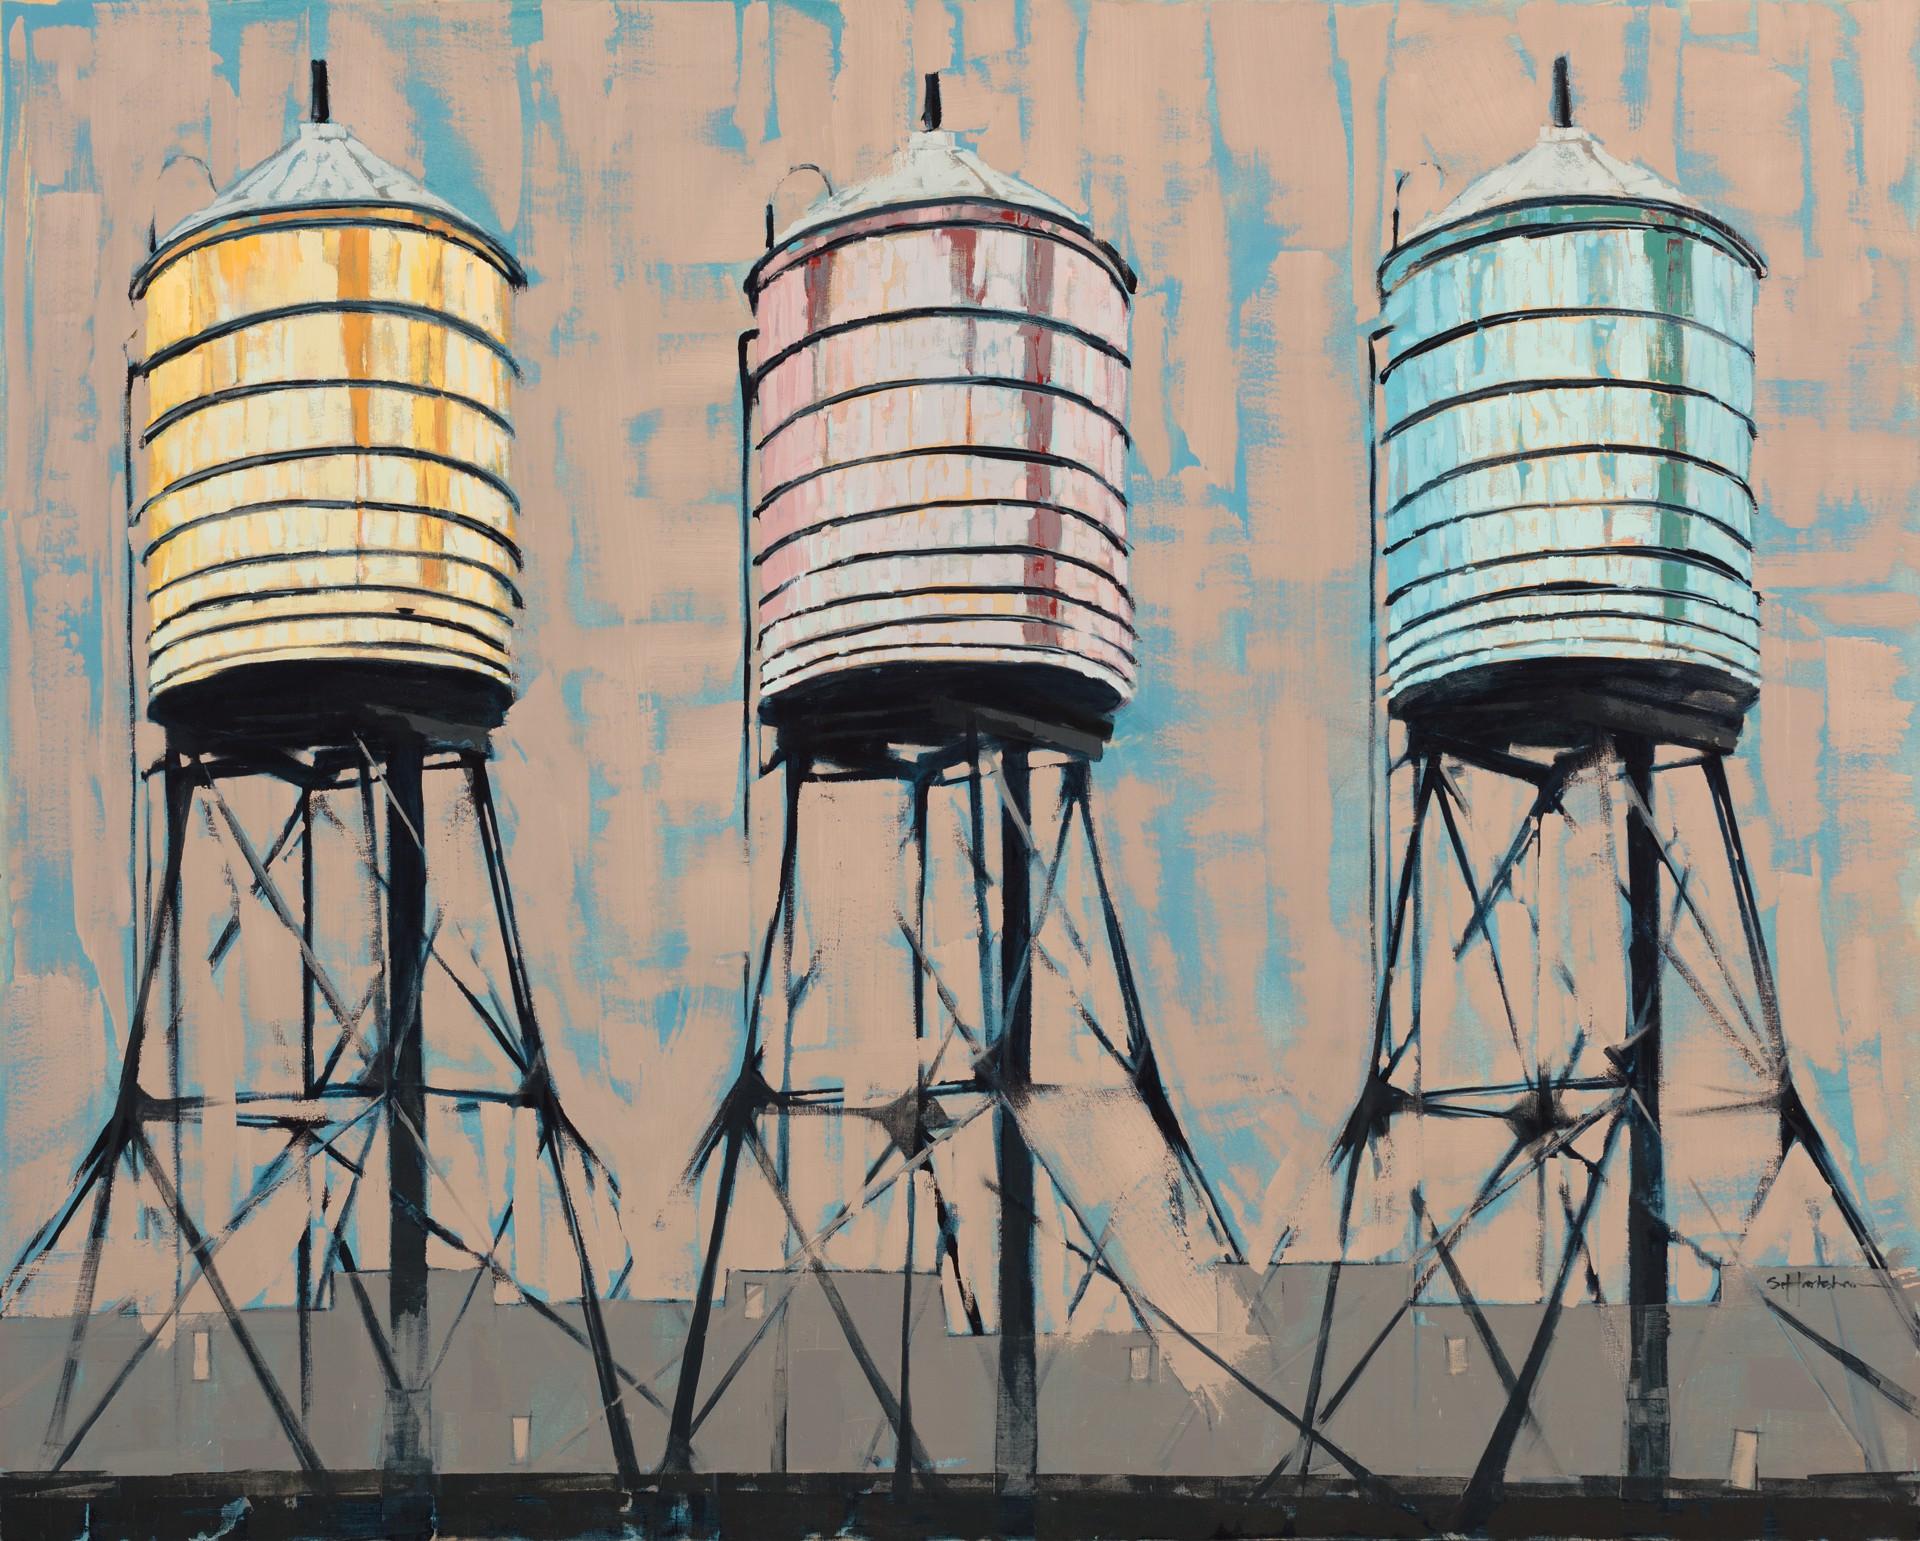 Towers Three by Stephanie Hartshorn